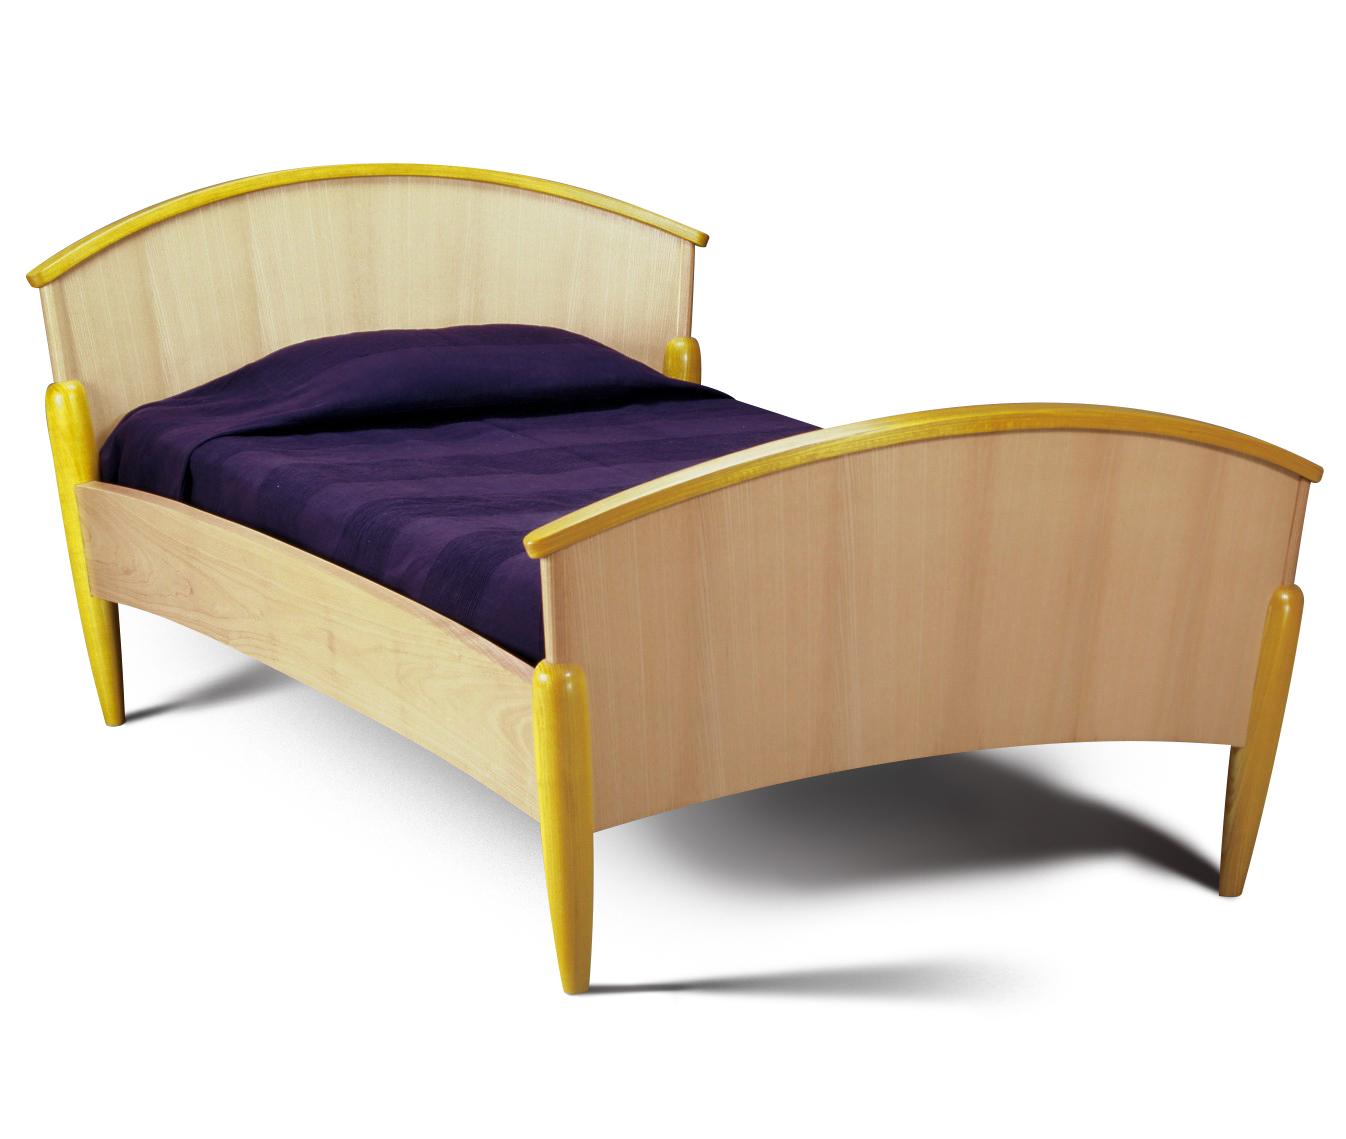 Rocket Bed